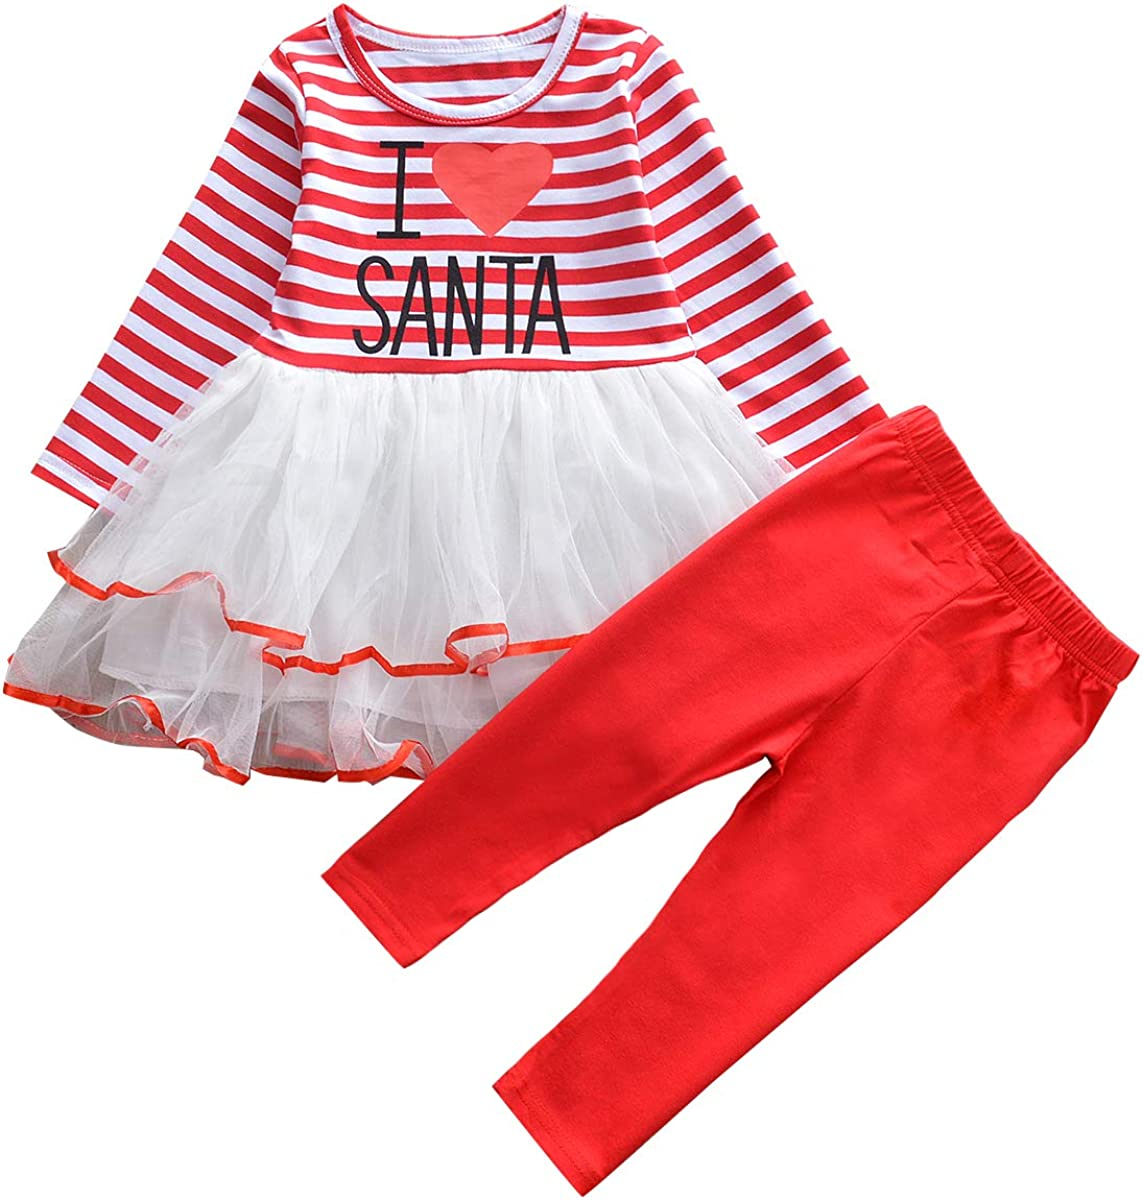 Cenhope Baby Girls Christmas Dress Red Black Plaid Long Sleeve Skirt Set with Bow Headband